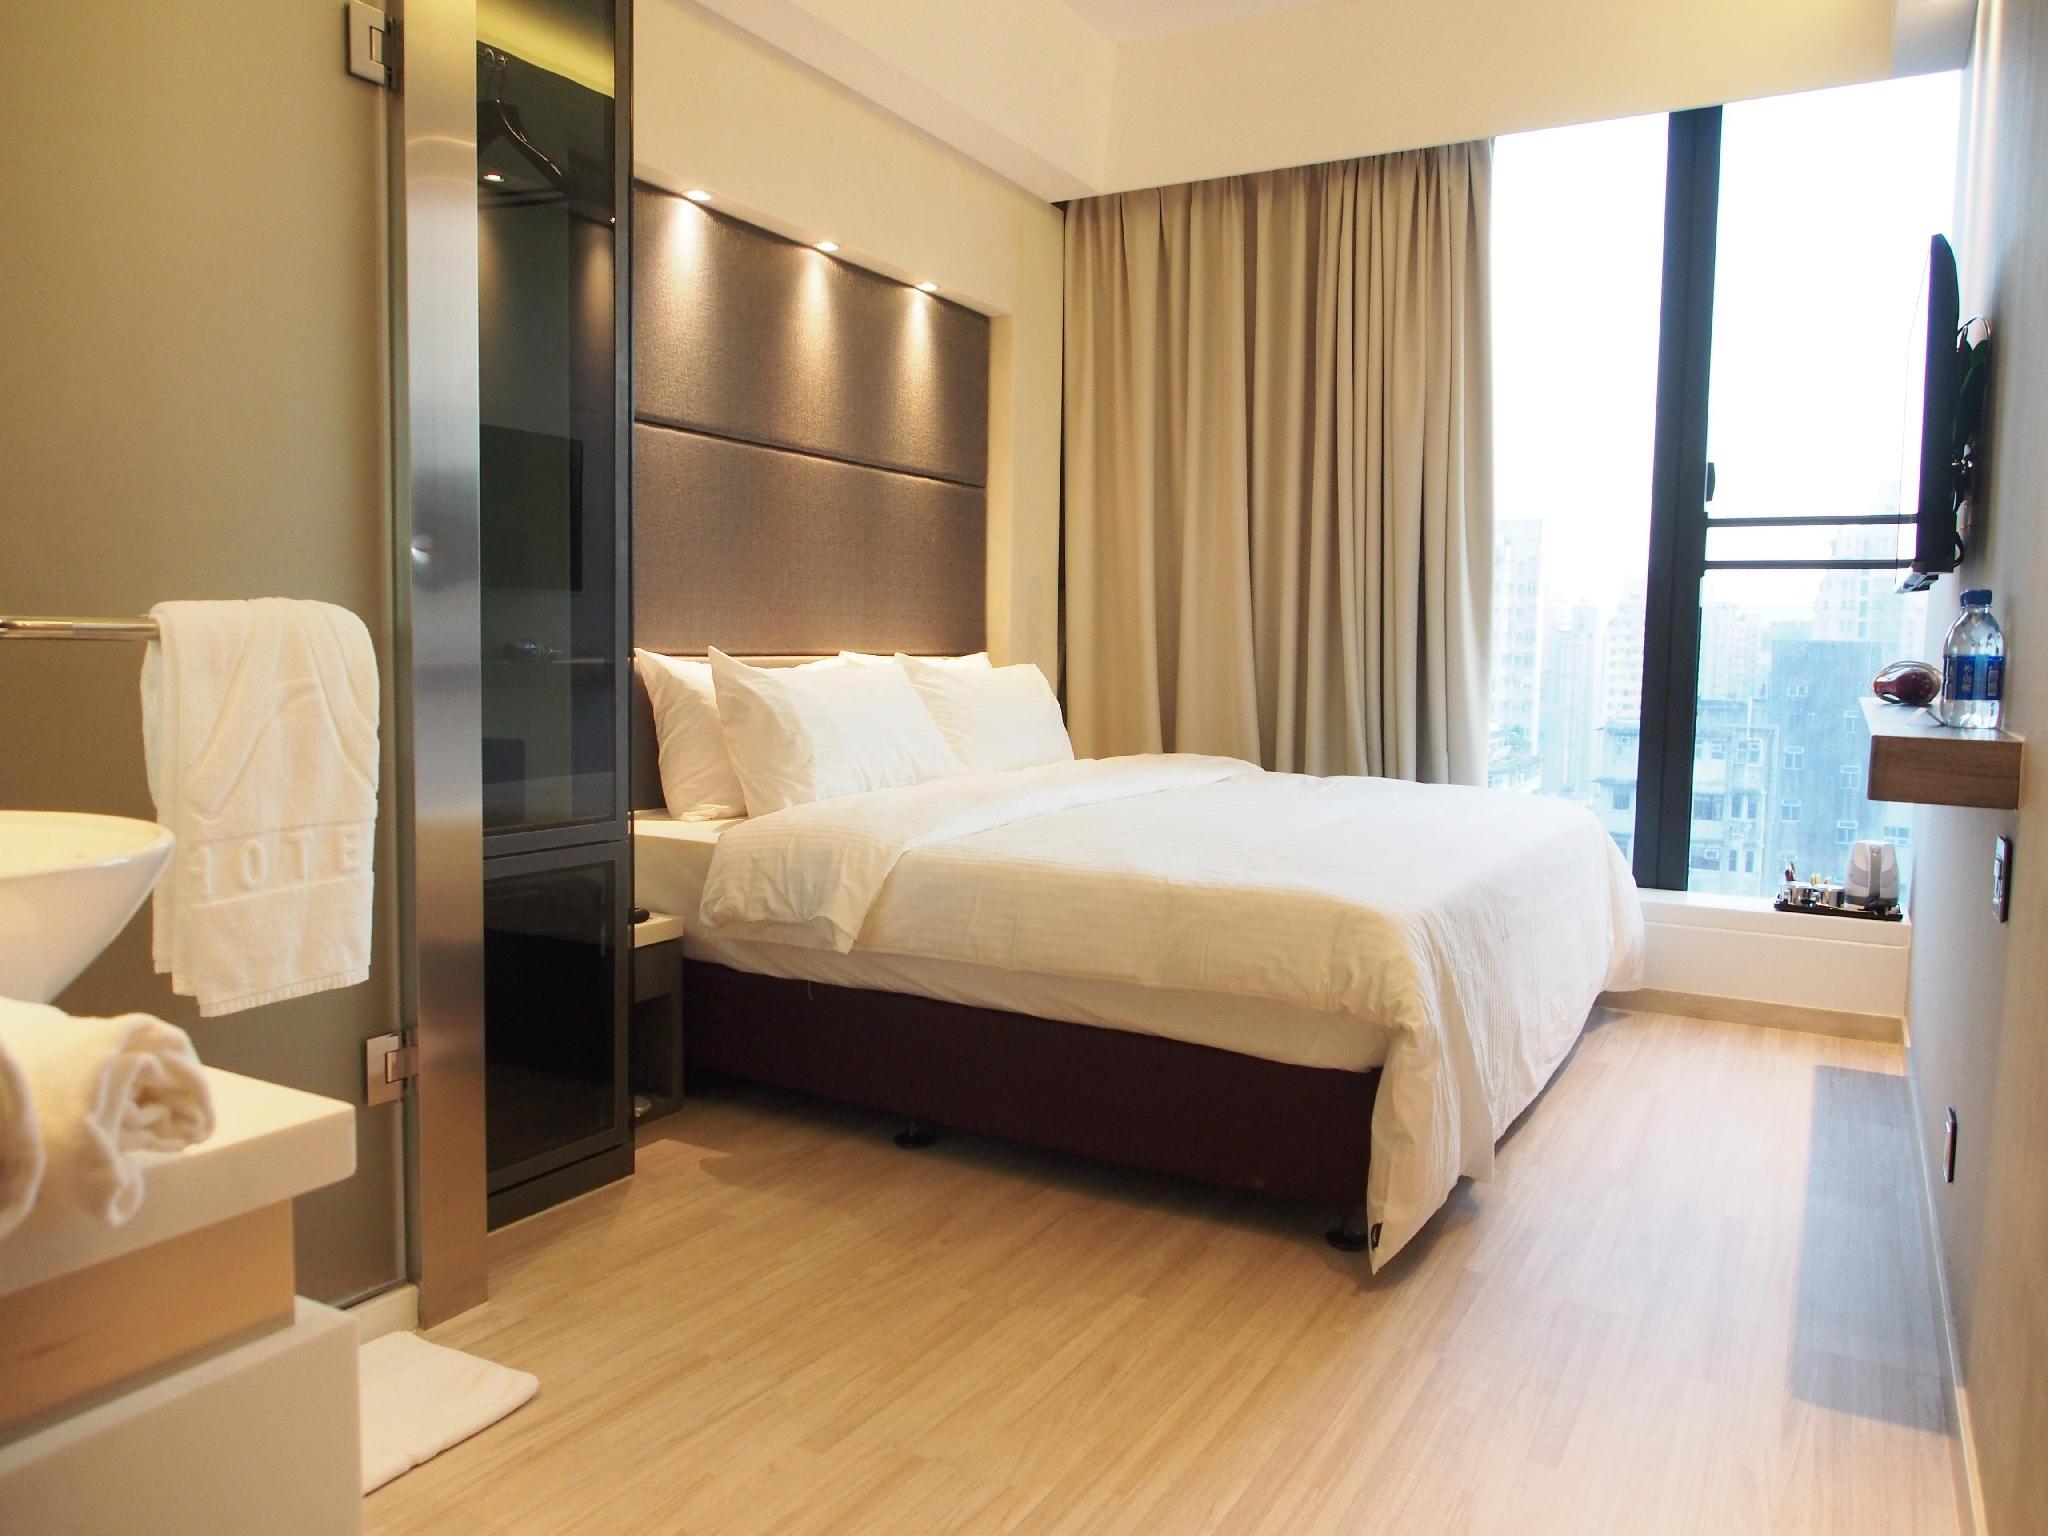 M1 Mong Kok Hotel